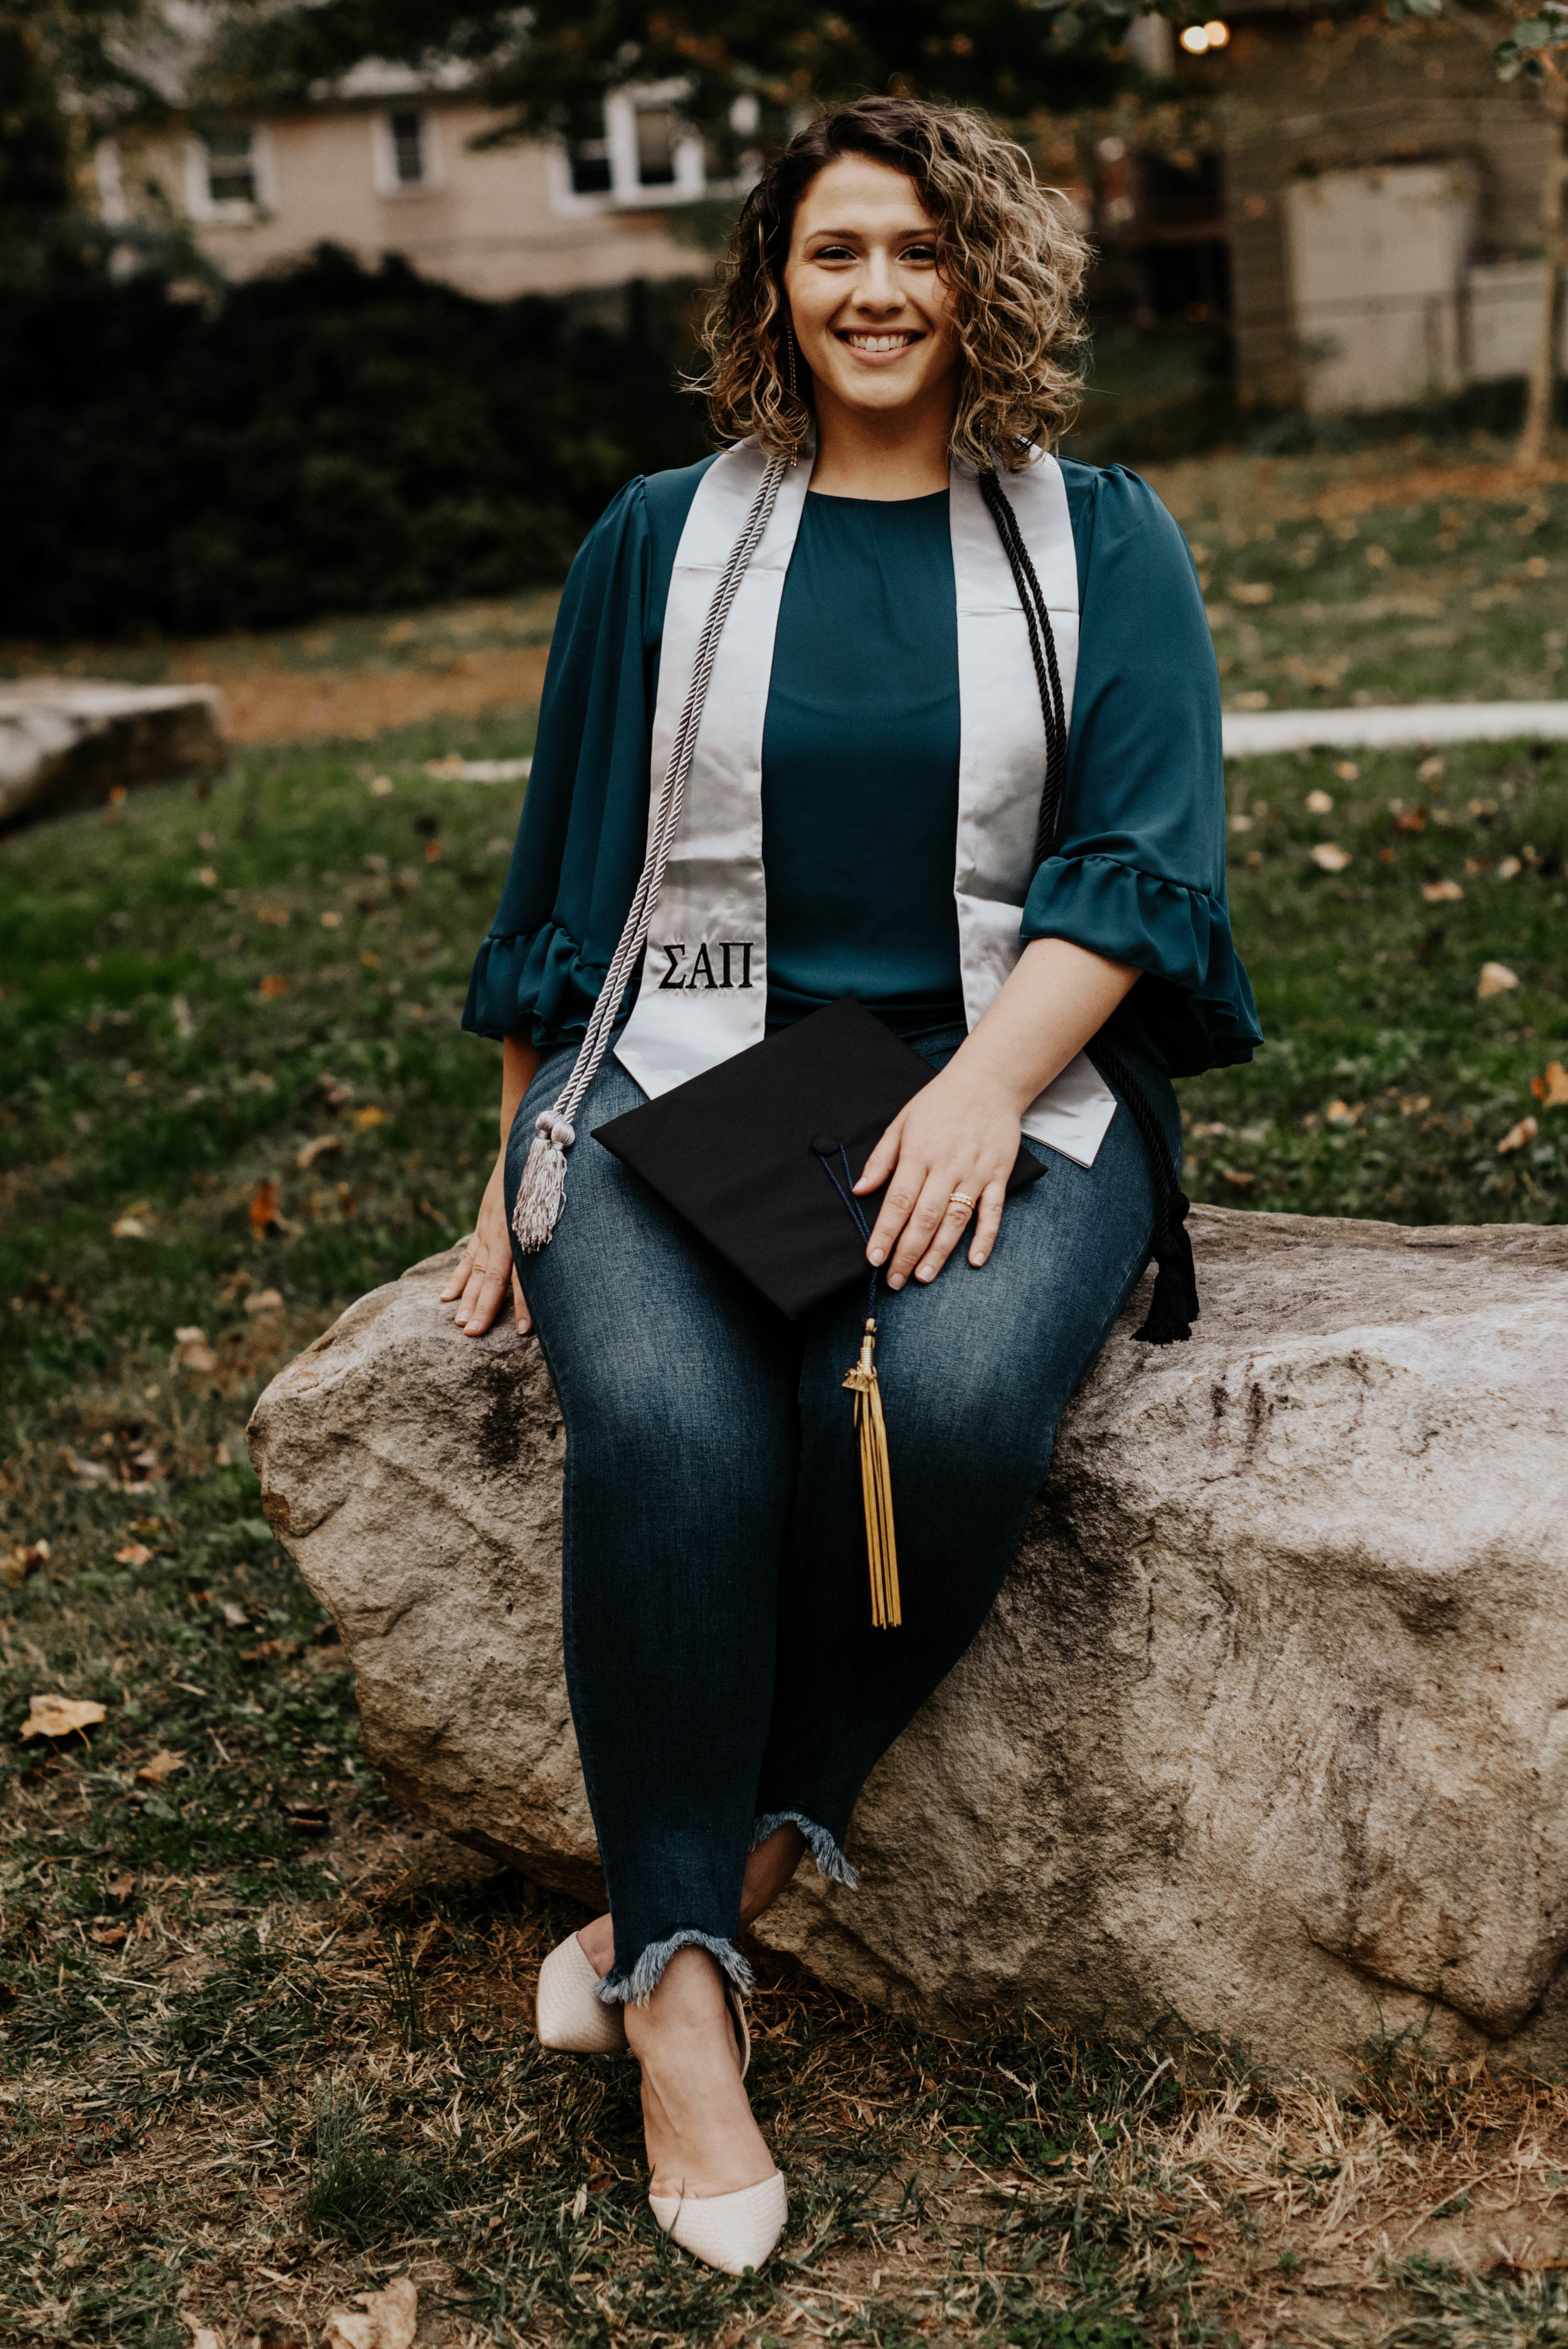 Erin-Kirkpatrick-Photography-Victoria-Graduation-Oct-2017-63.jpg